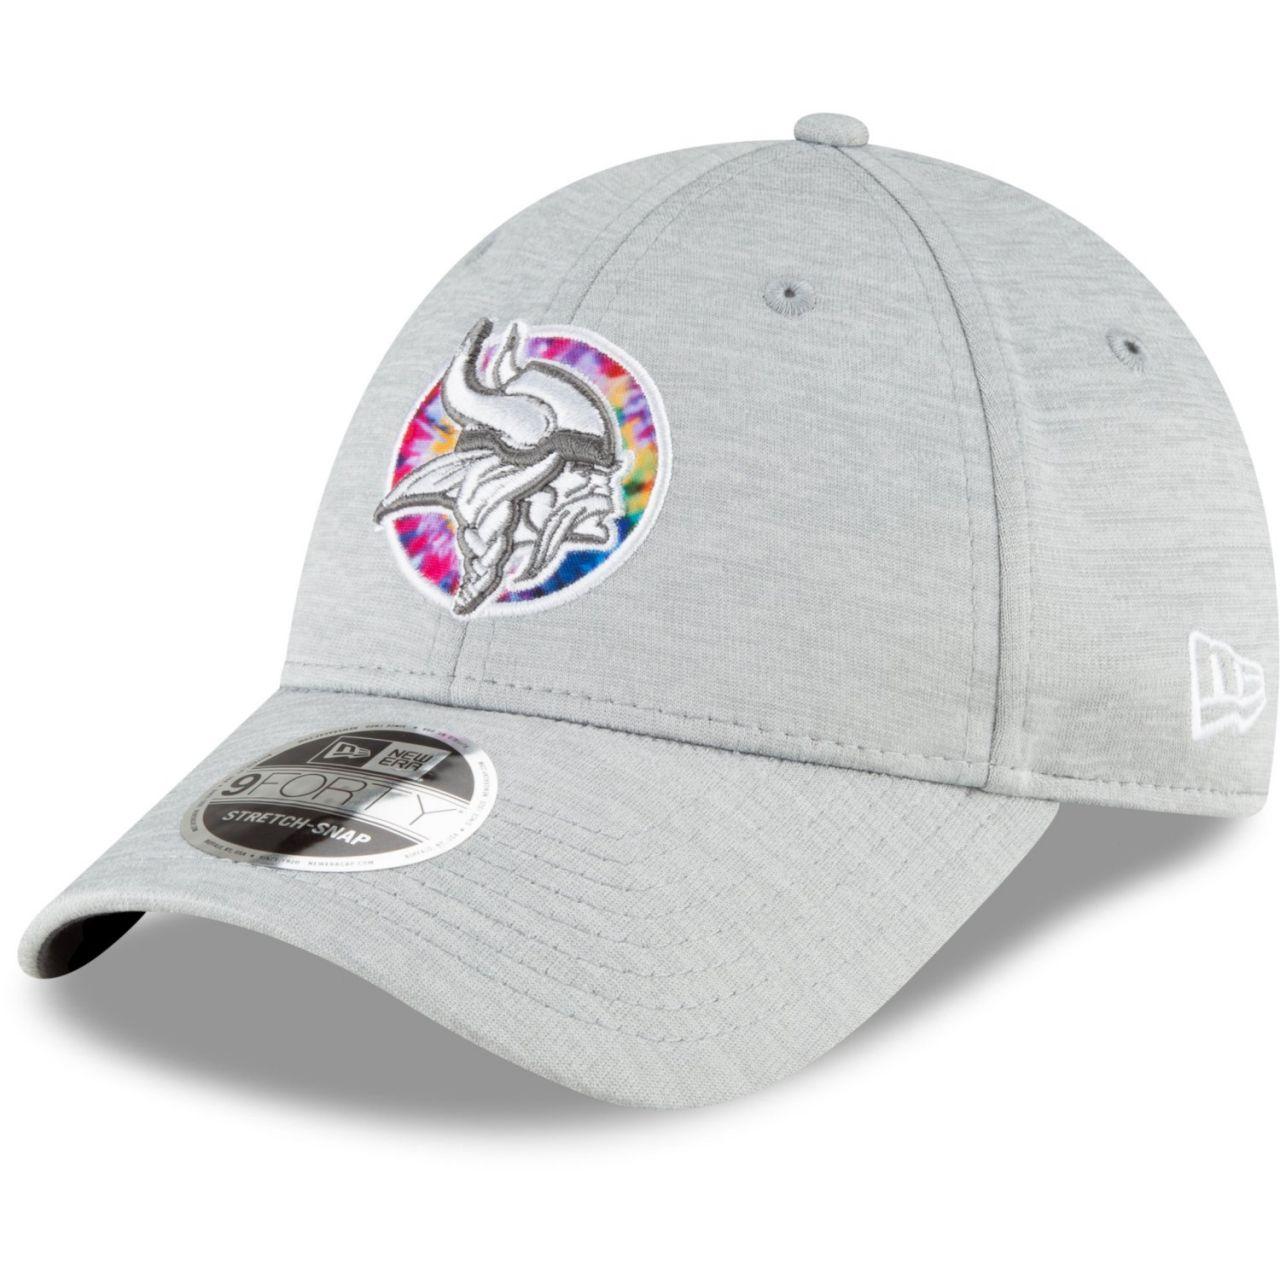 amfoo - New Era 9FORTY Stretch Cap - CRUCIAL CATCH Minnesota Vikings